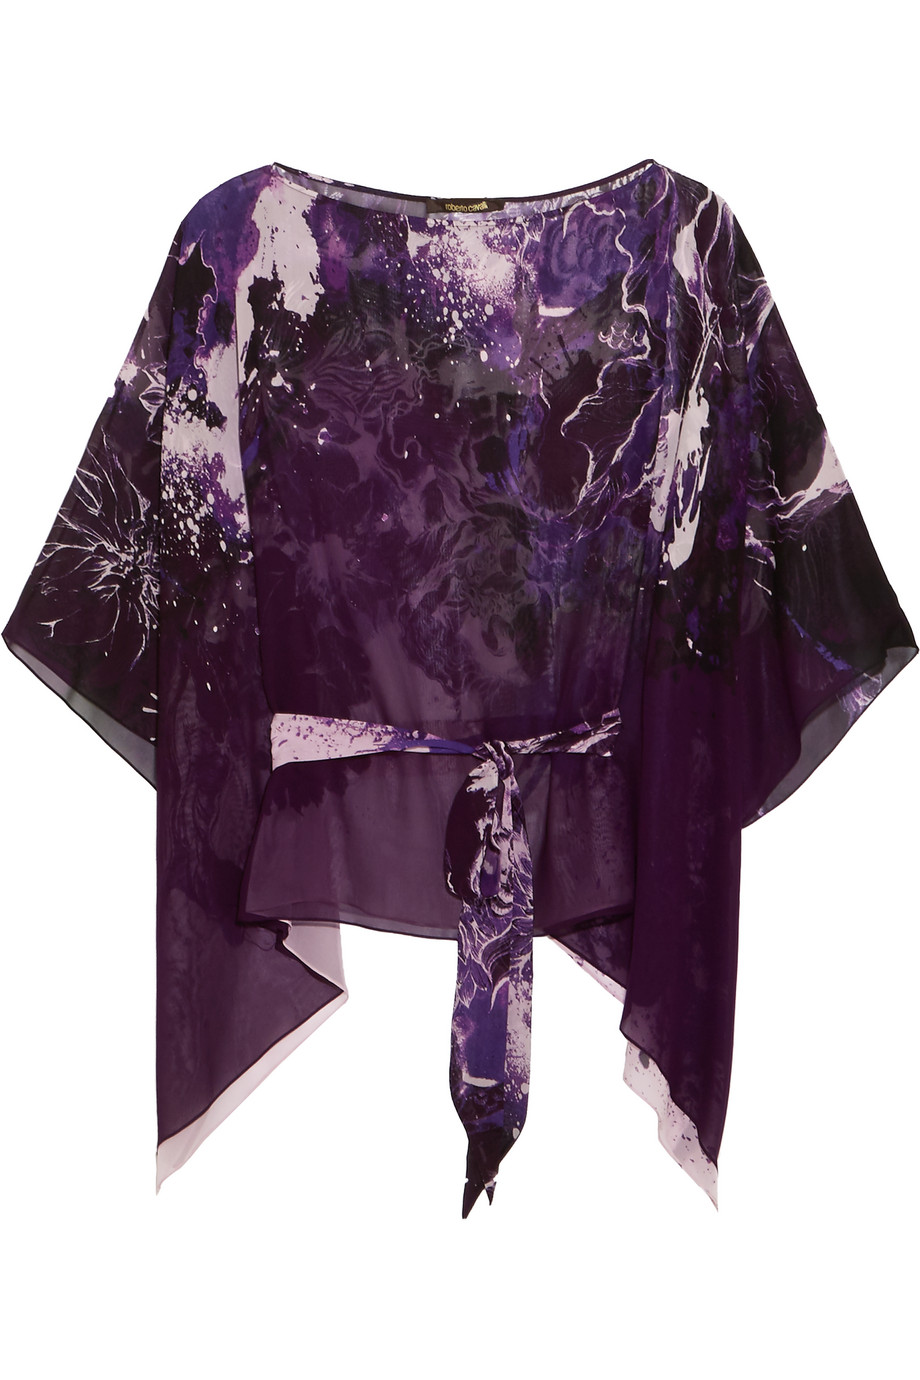 Roberto Cavalli Printed Silk-Georgette Top, Purple, Women's, Size: 38